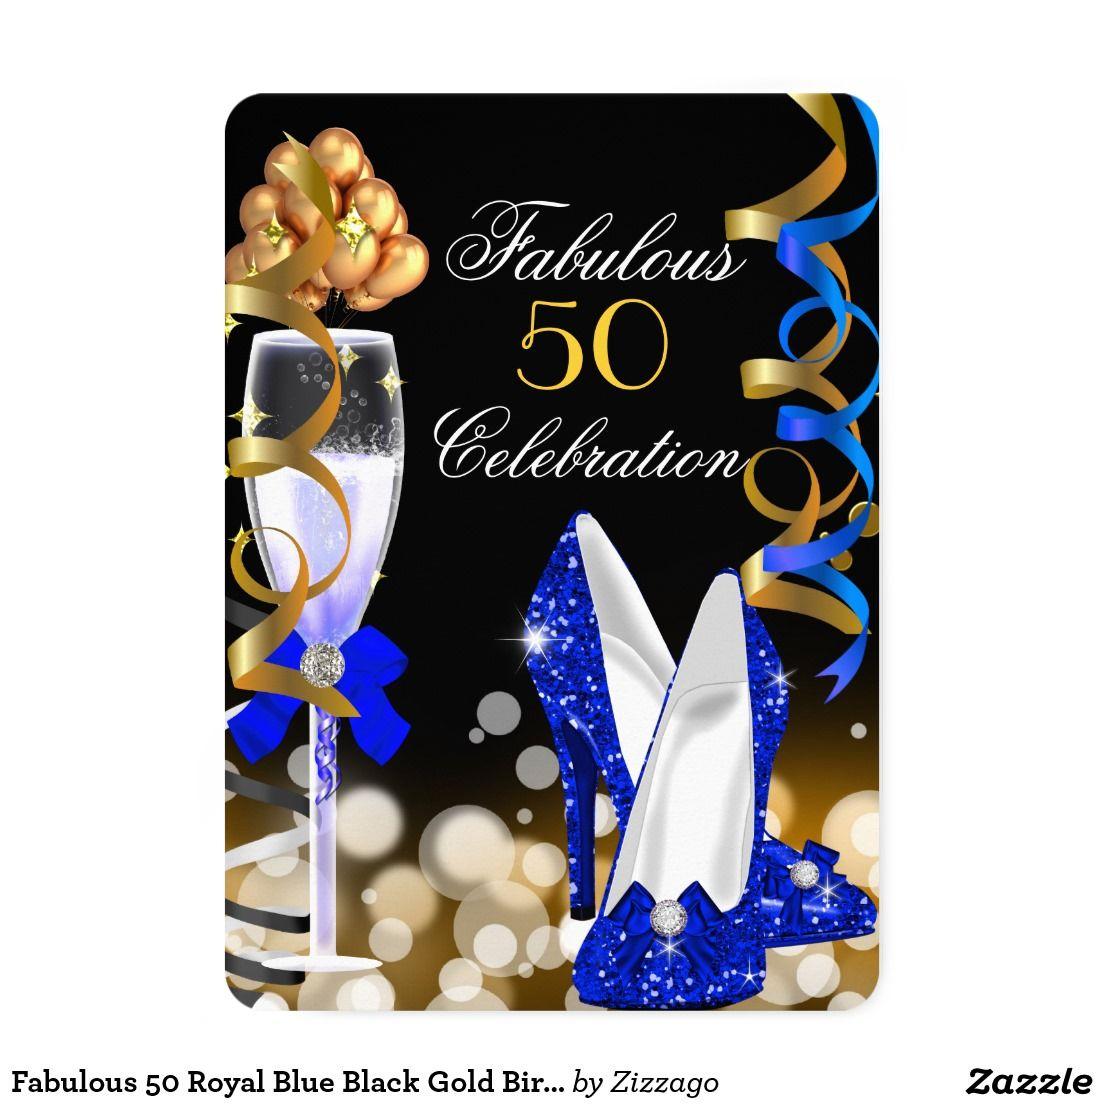 Fabulous 50 Royal Blue Black Gold Birthday Party Invitation